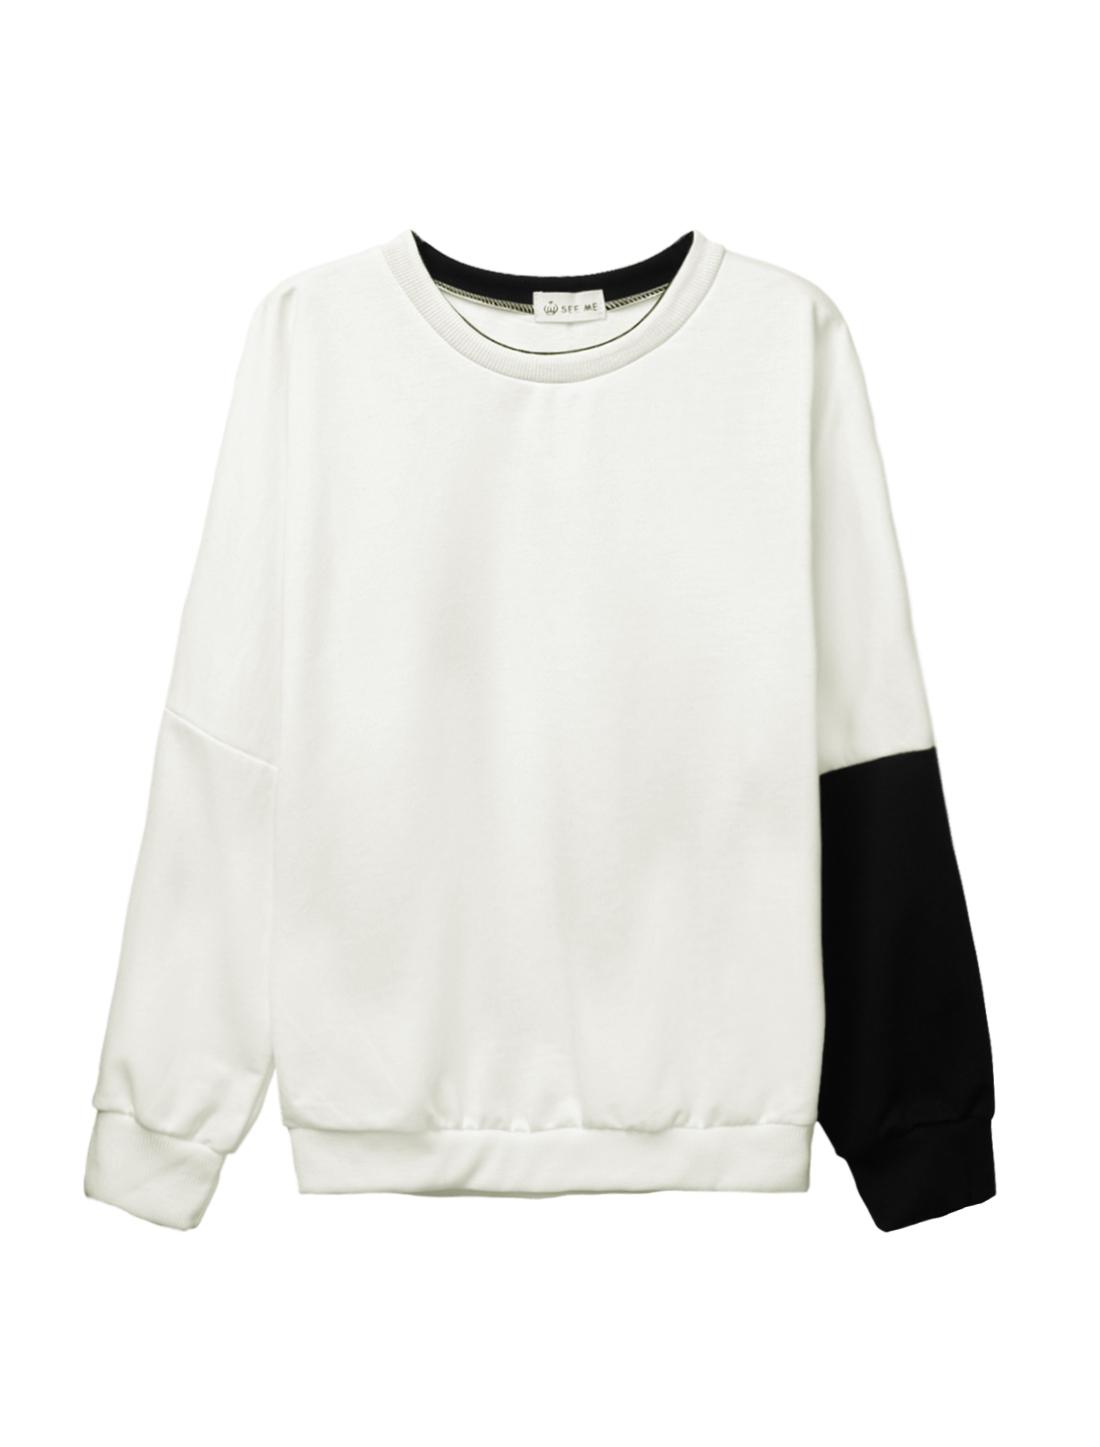 Women Crew Neck Dolman Sleeves Color Block Casual Sweatshirt White XS